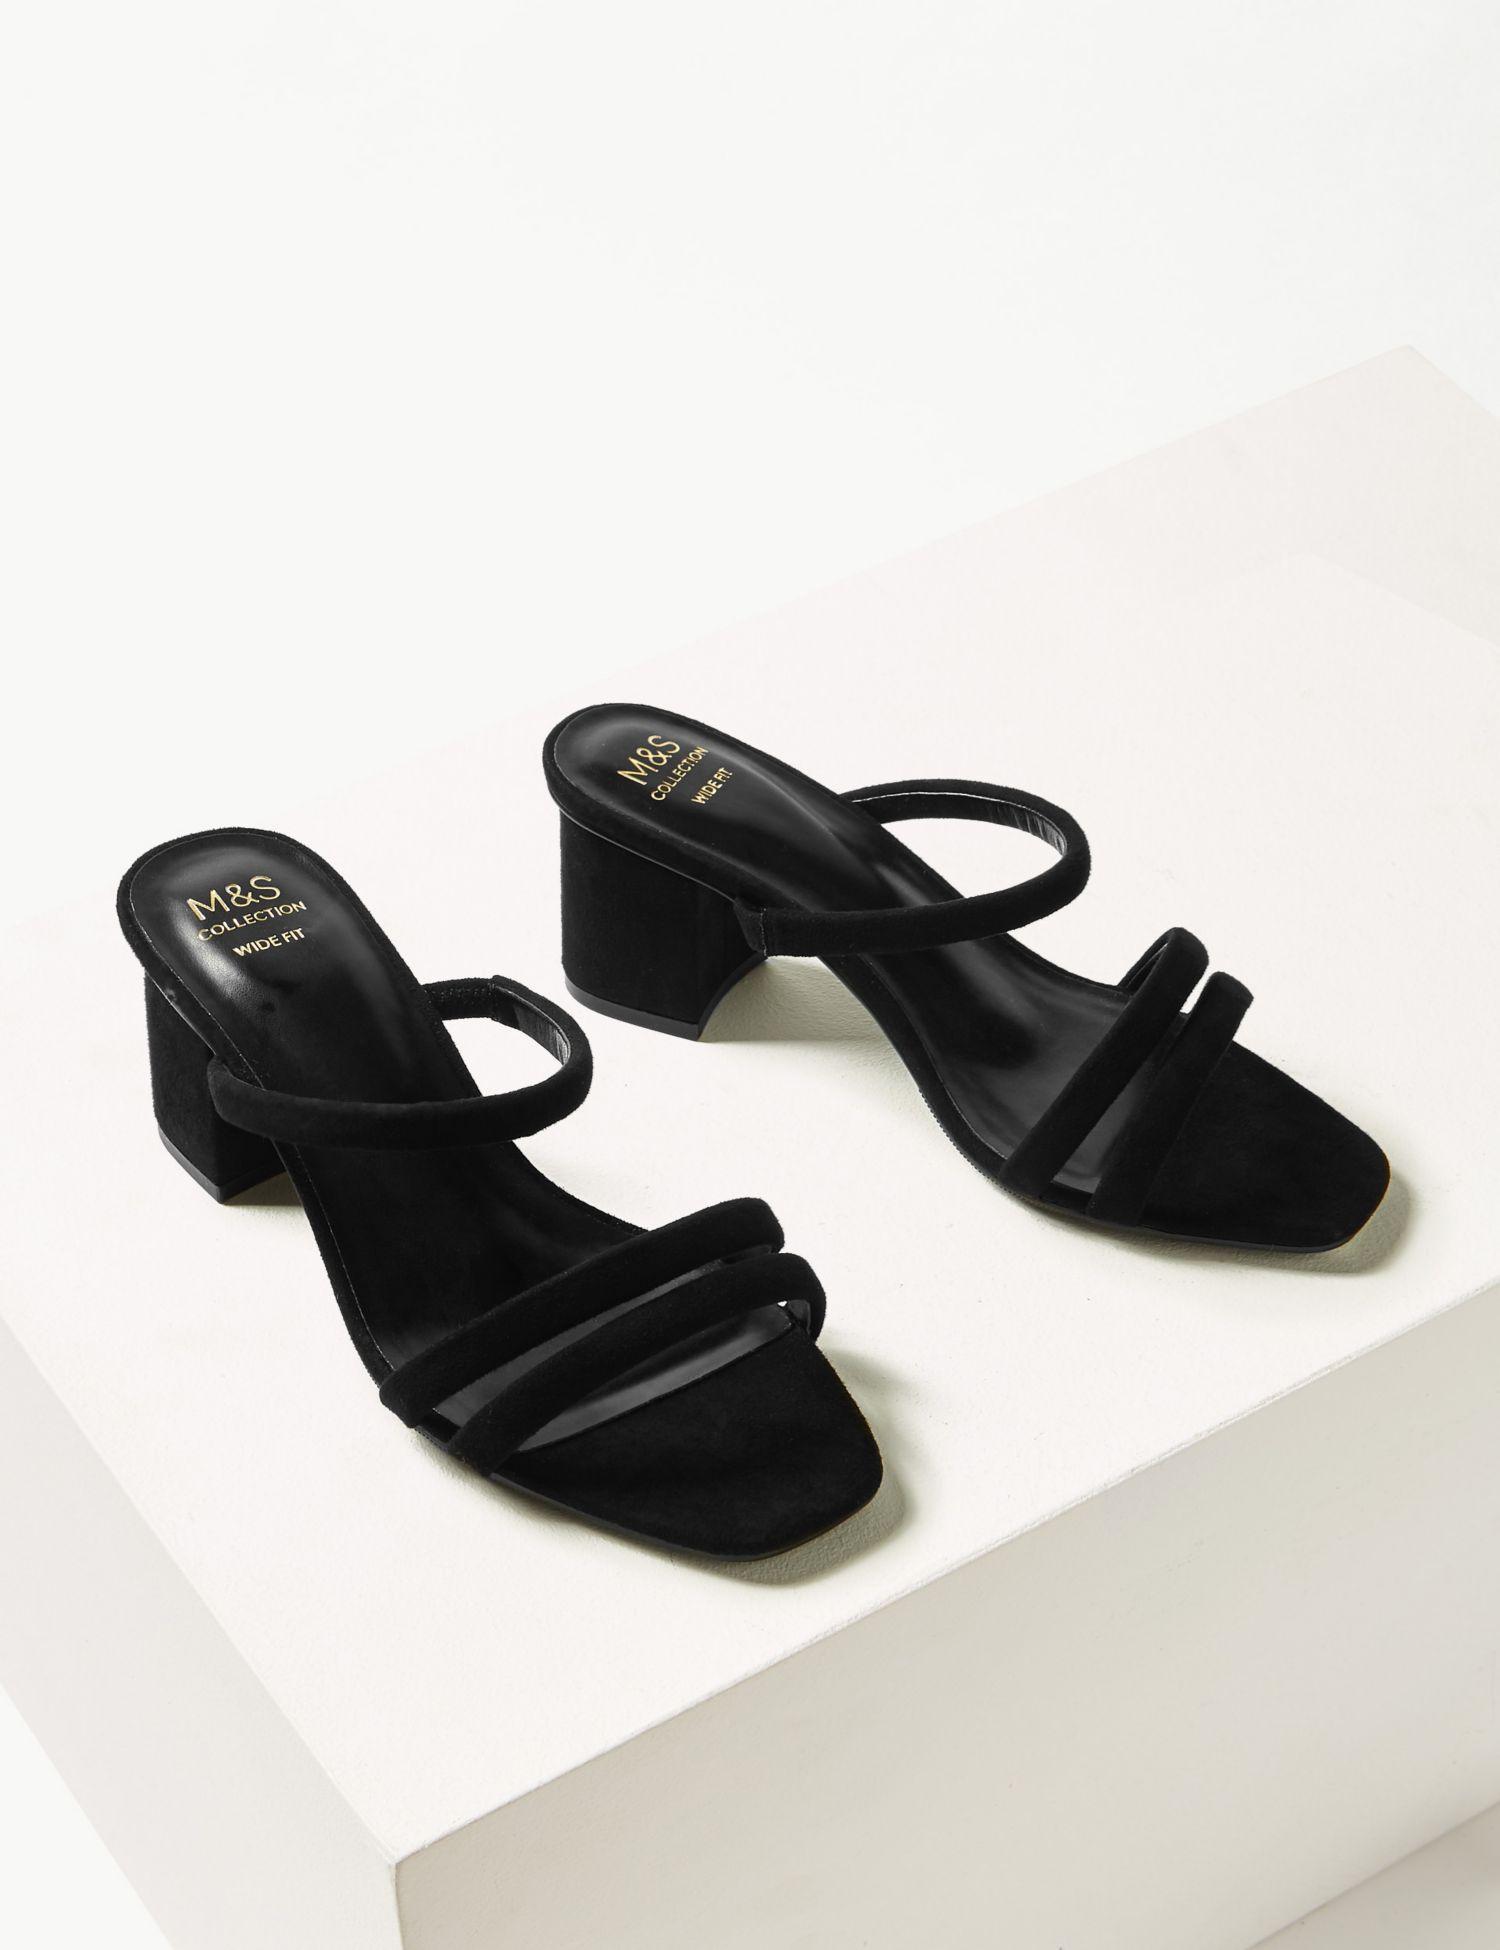 3f10f78a91b0 Marks & Spencer Wide Fit Multi Strap Mule Sandals in Black - Lyst